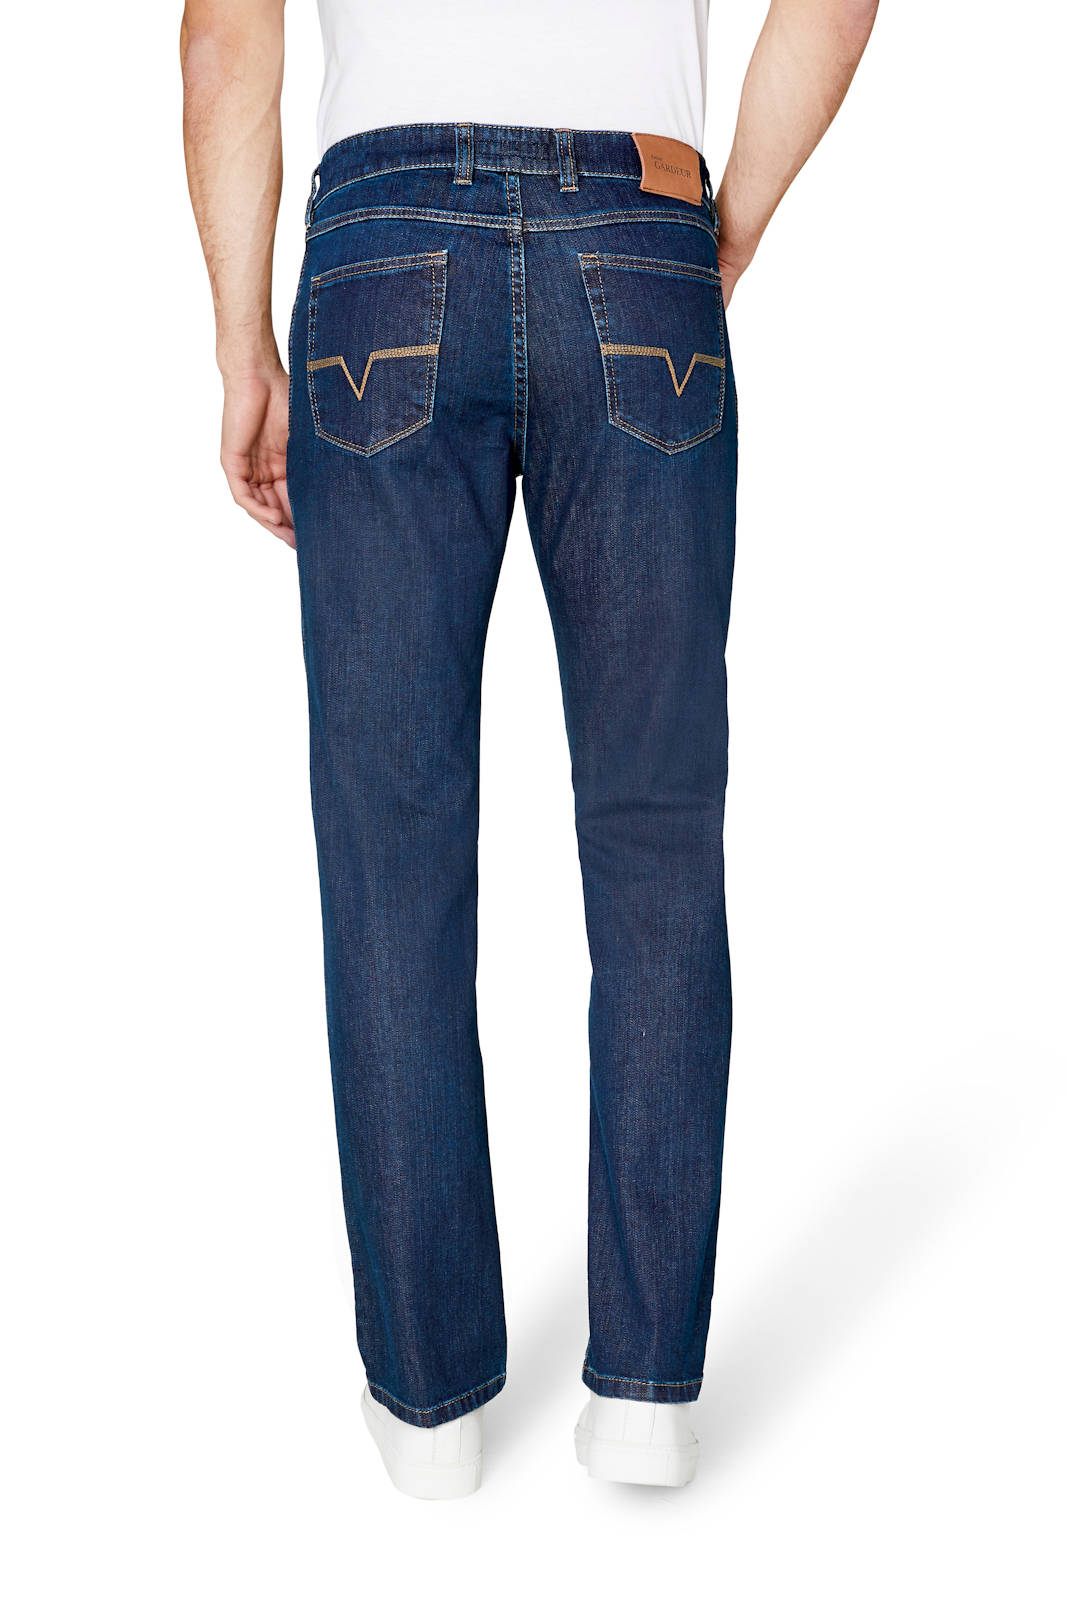 Atelier-GARDEUR-Jeans-NEVIO-11-Regular-Fit-Herren-Hose-Straight-Leg-Denim-NEU Indexbild 8